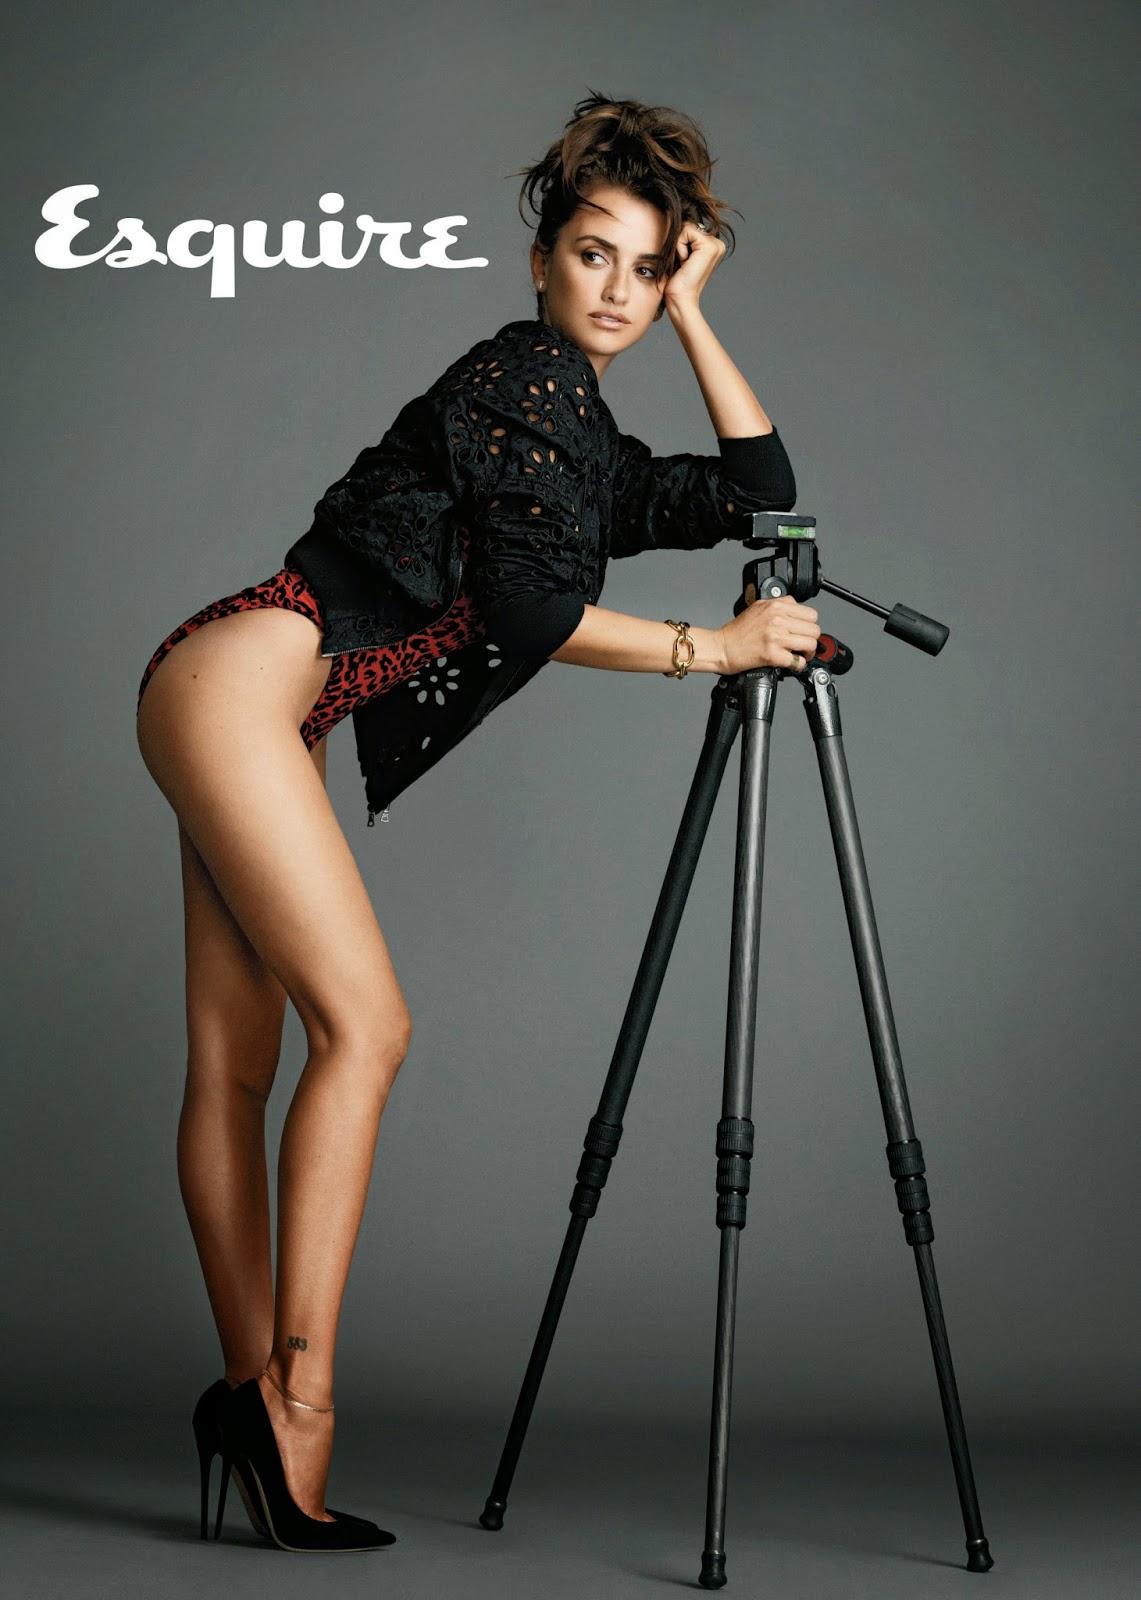 Penelope Cruz hot legs and ass